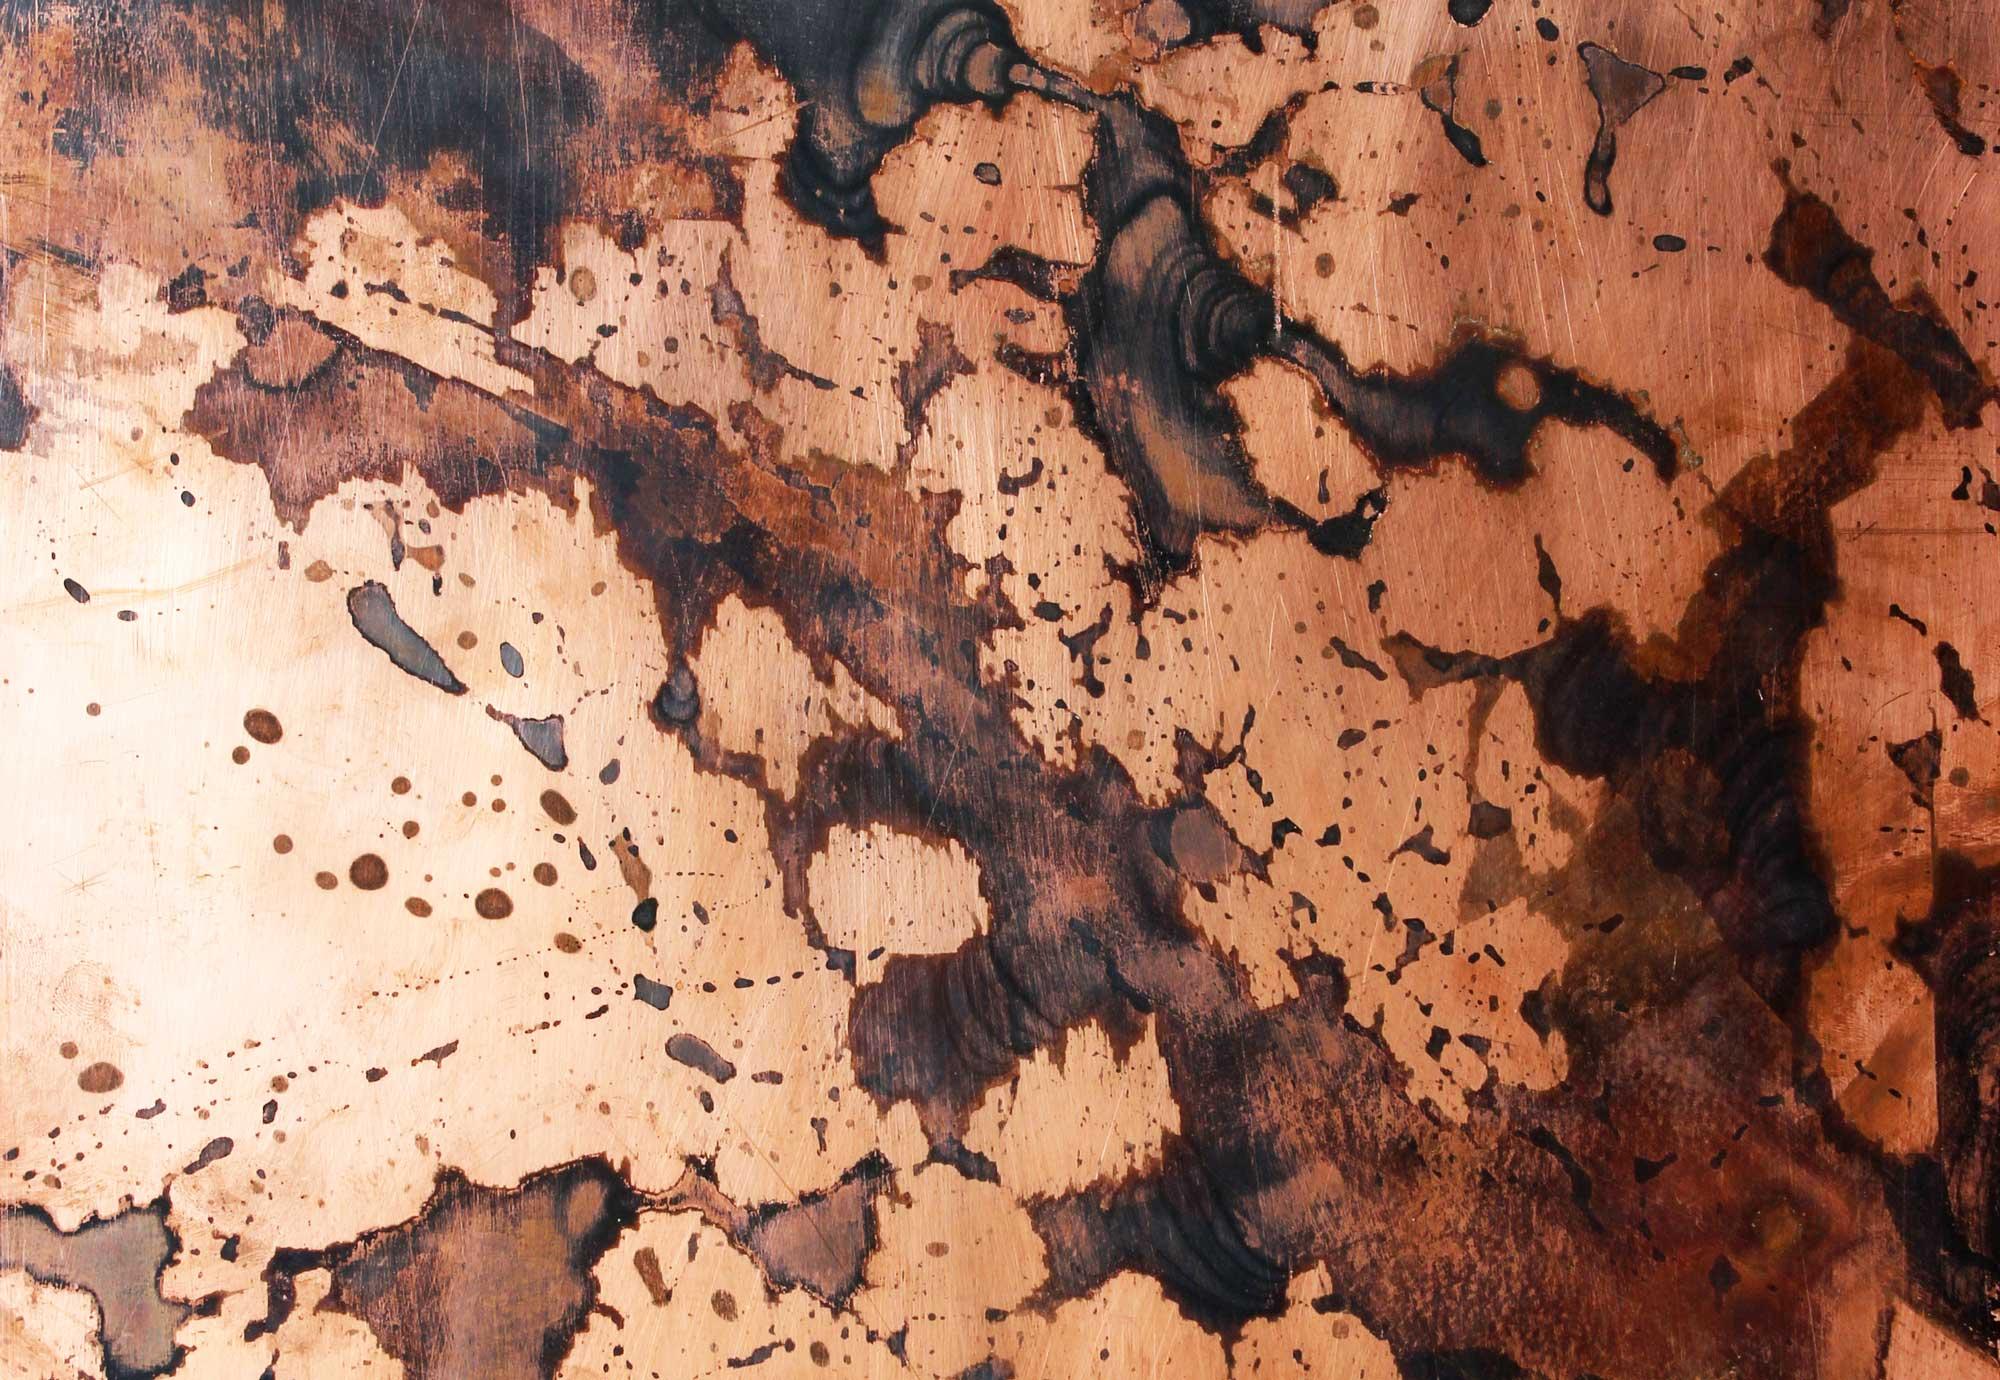 wandpaneele-metall-kupfer-oxidiert-schwarze-patina-kupfer-tupfer